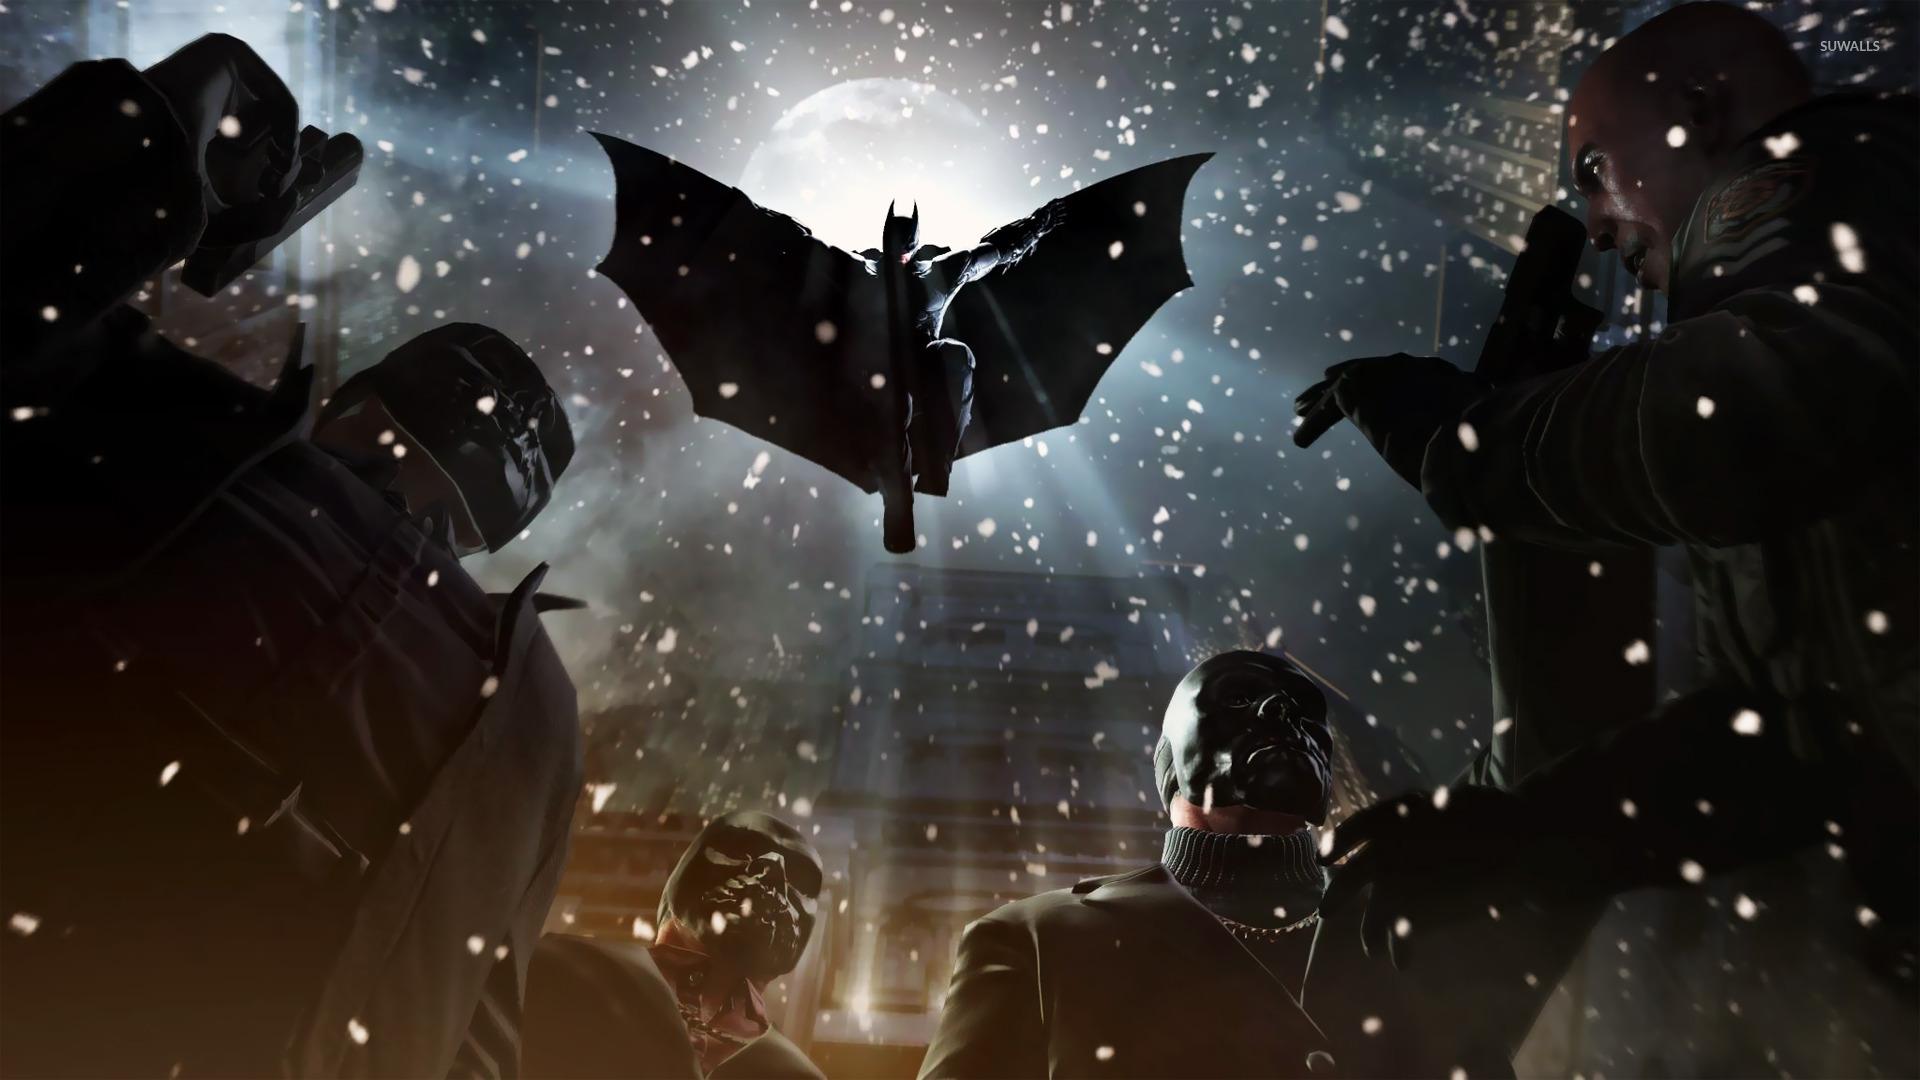 Batman Arkham Origins wallpaper   Game wallpapers   21646 1920x1080